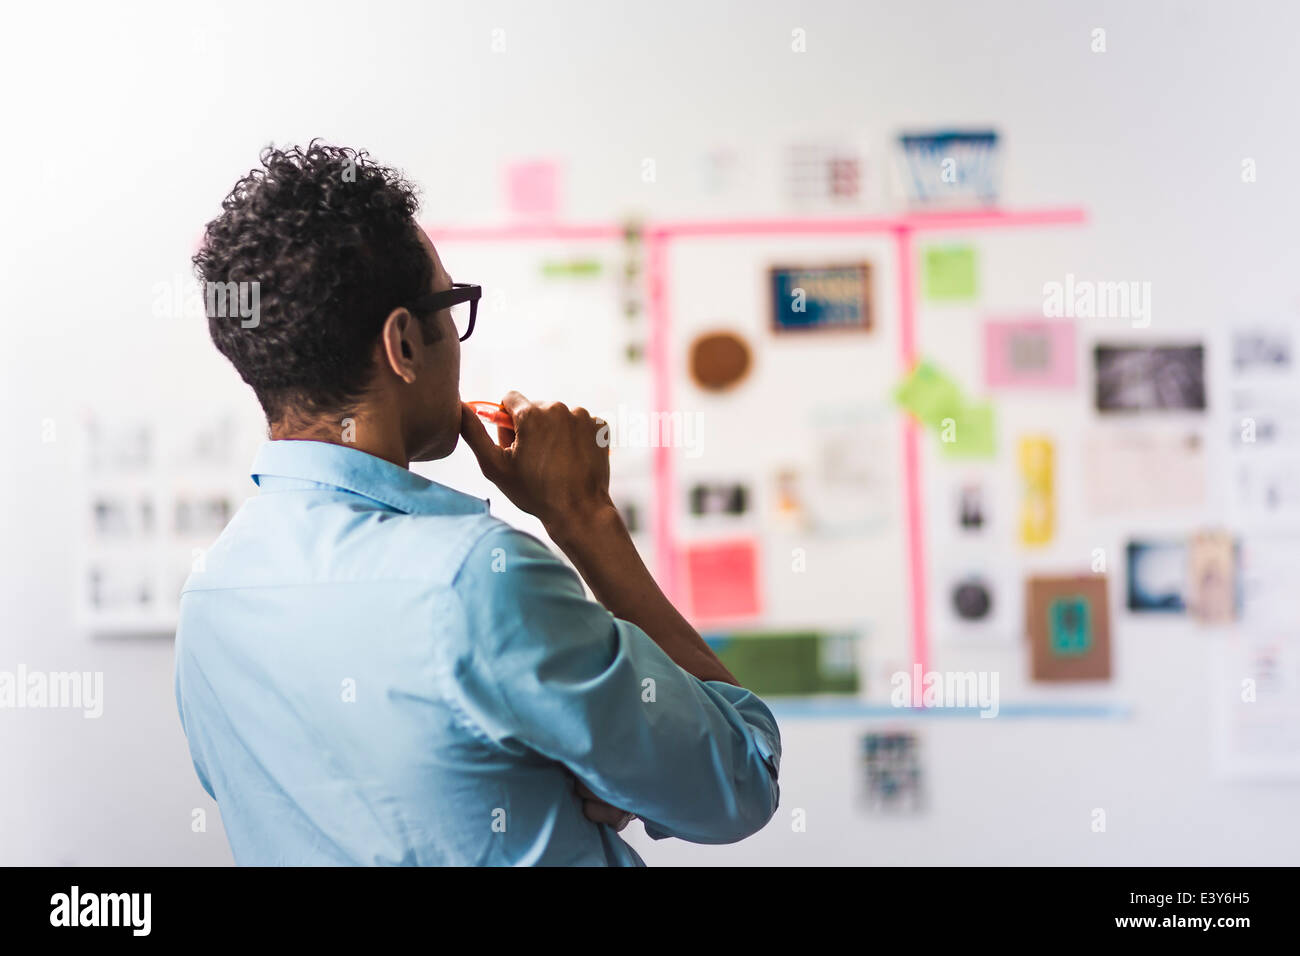 Junger Mann studieren Wand der Notizen im Büro Stockbild